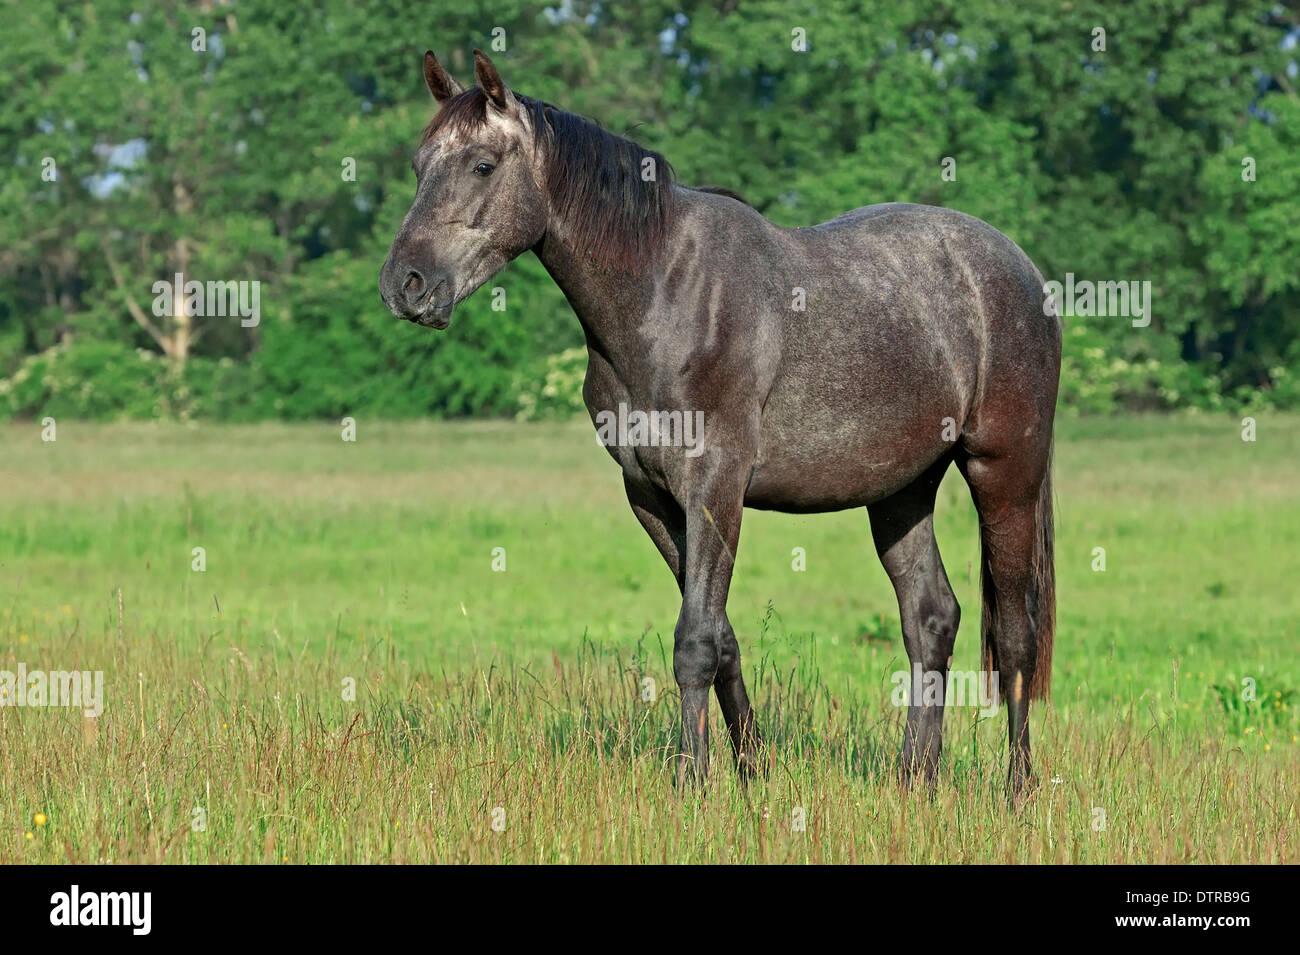 Westphalian Horse - Stock Image